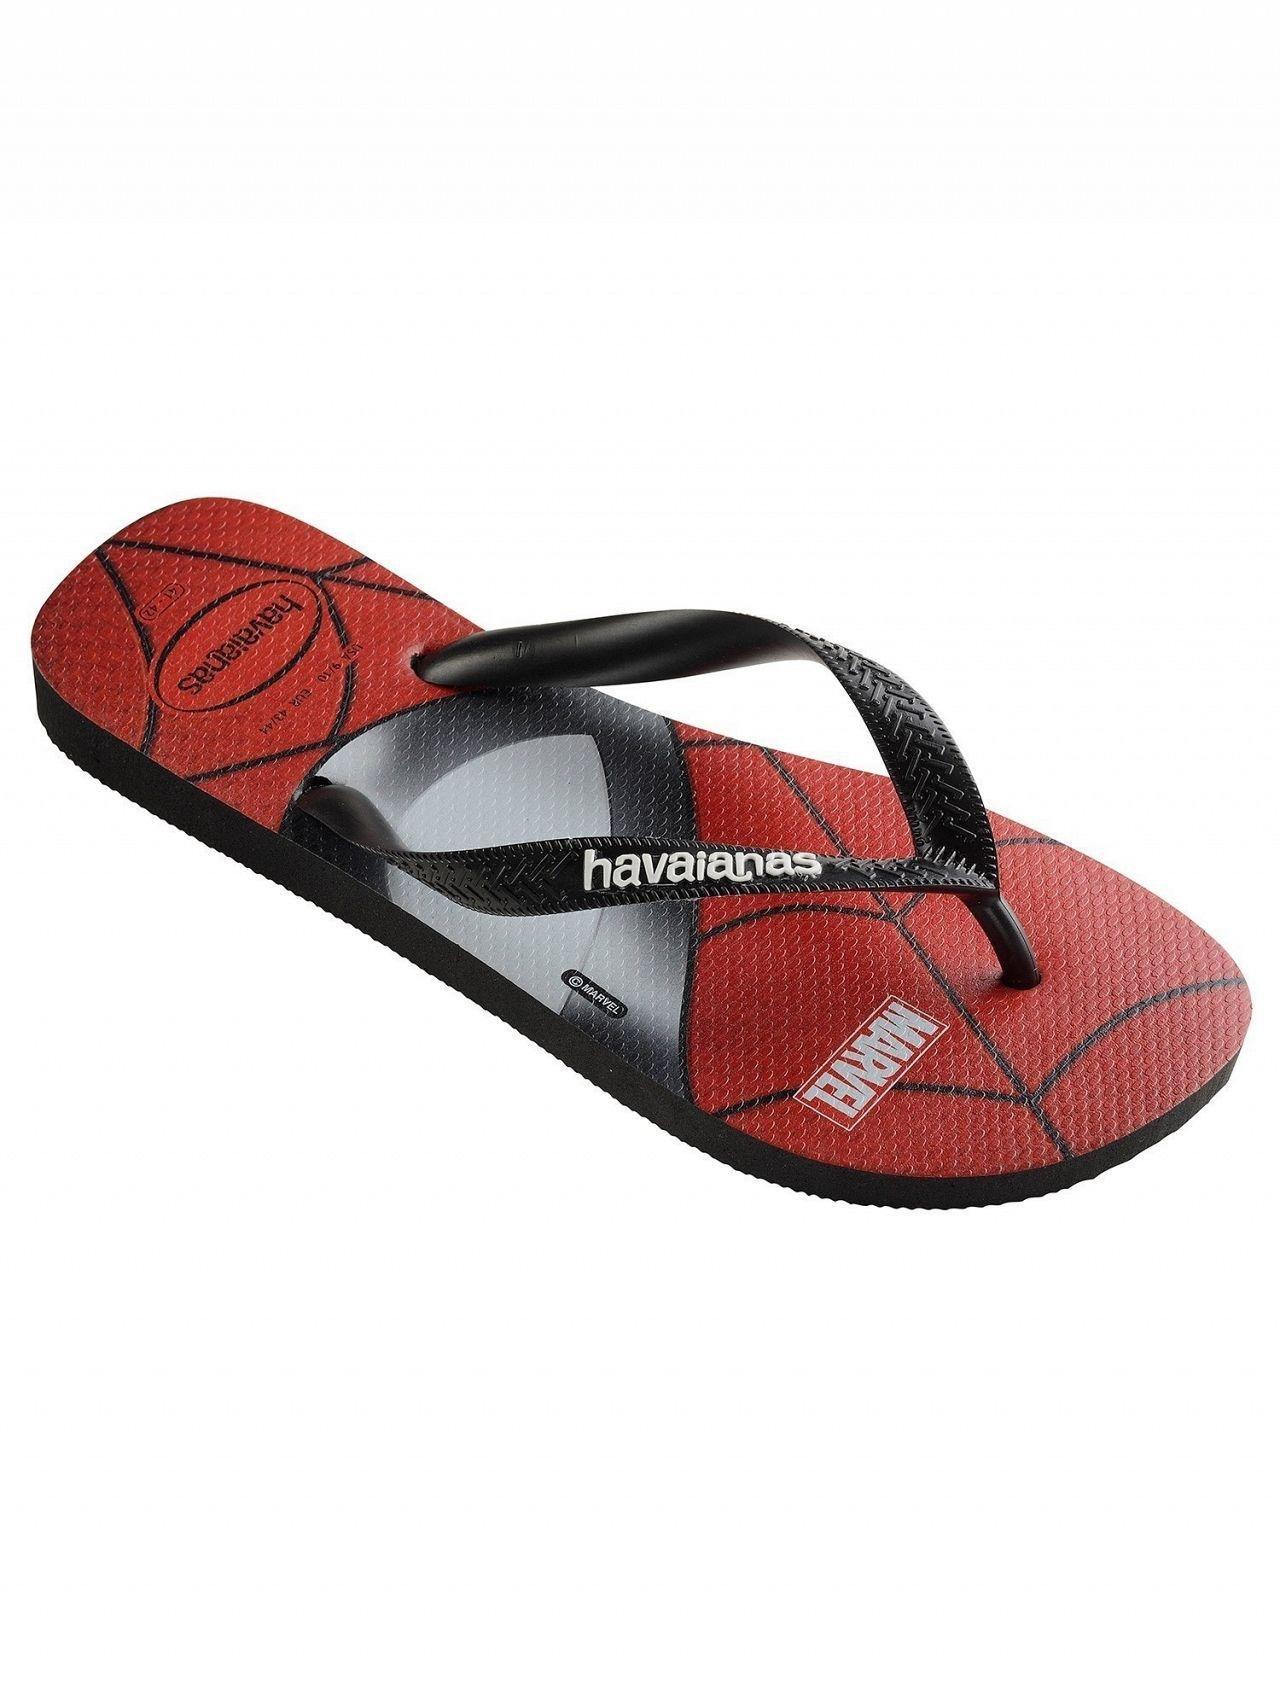 930b14432 Havaianas Black Top Marvel Flip Flops in Black for Men - Save 14% - Lyst